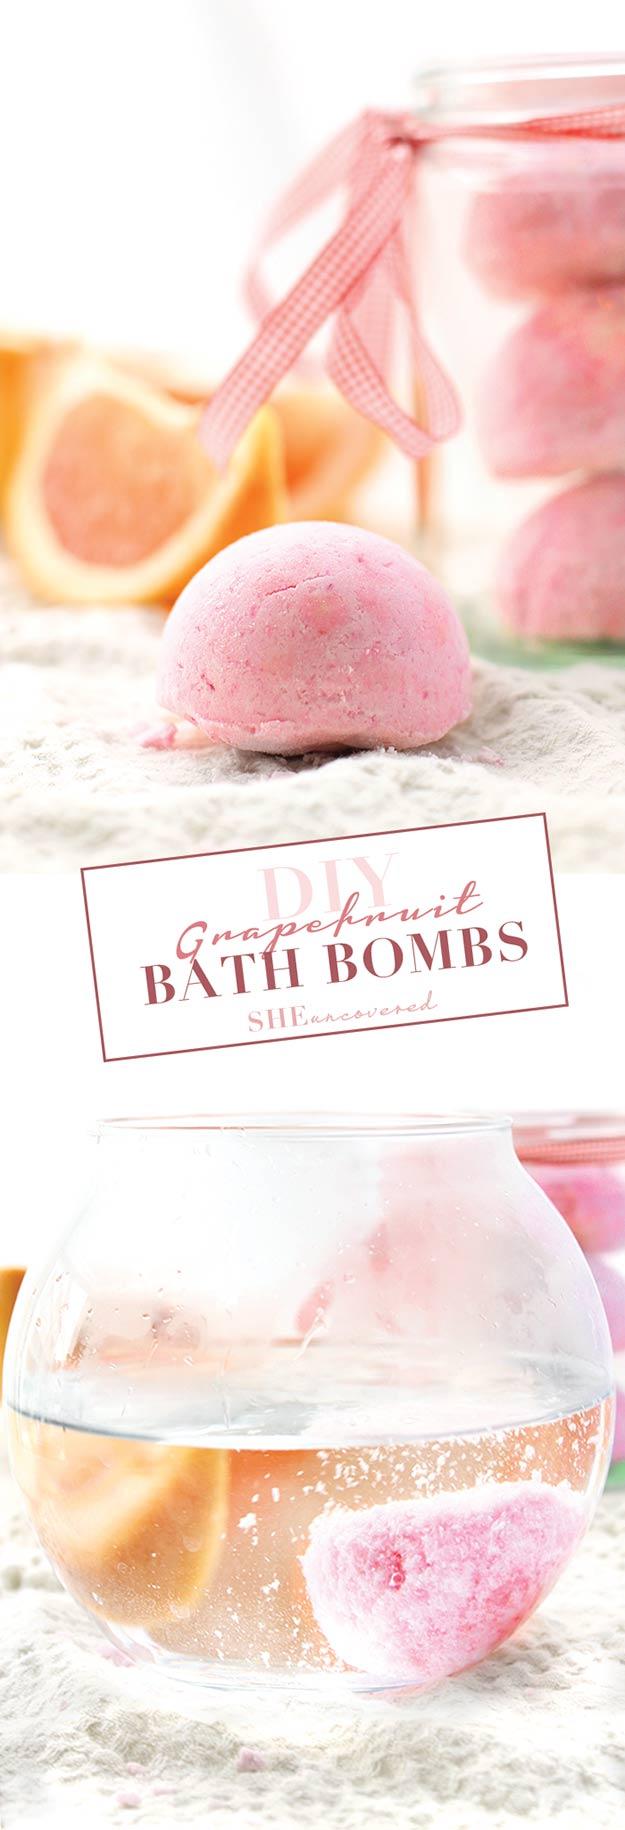 Best DIY Ideas from Pinterest | Homemade Bath Bomb Recipes and Tutorials | Make Grapefruit Bath Bombs at Home Like Lush